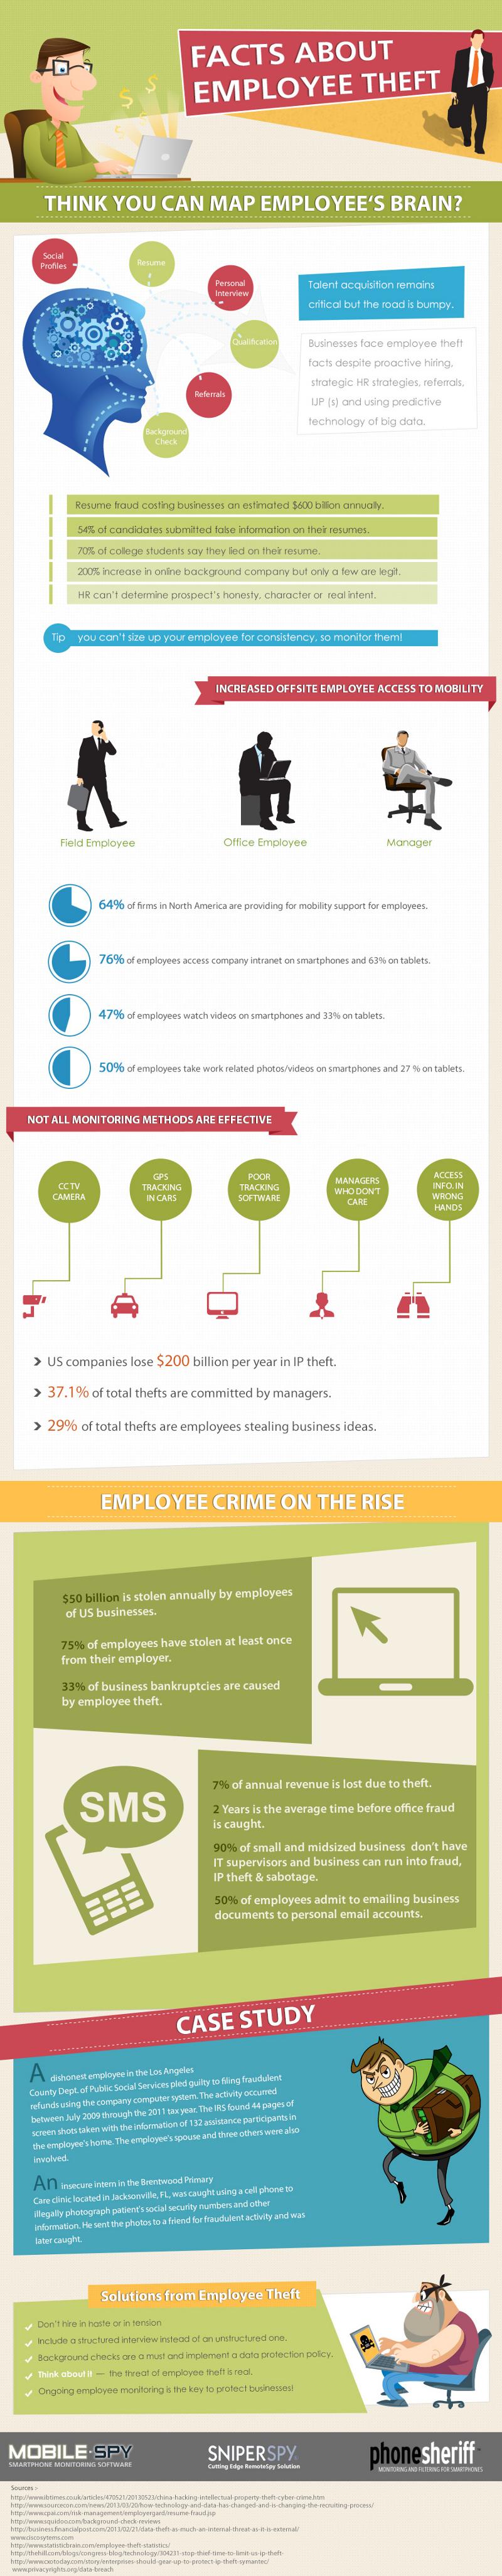 Employee-Theft-Statistics